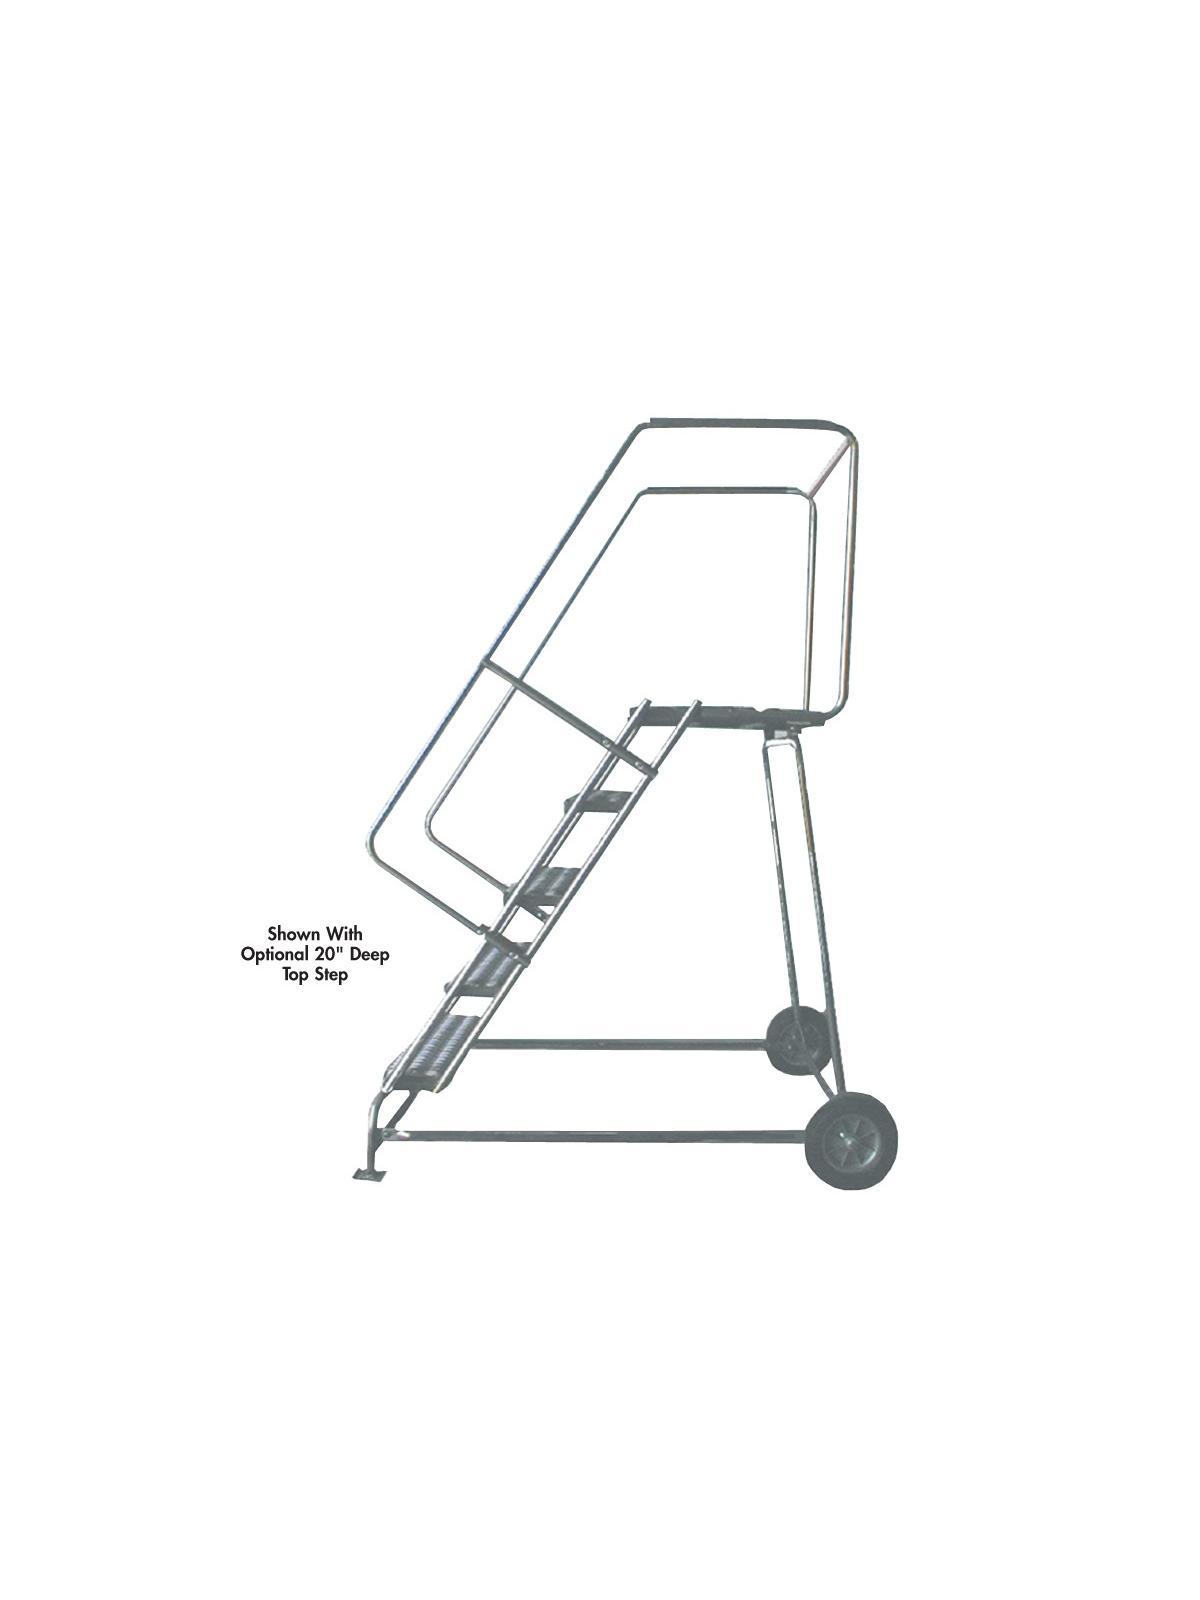 Aluminum Ladders Wheelbarrow Style At Nationwide